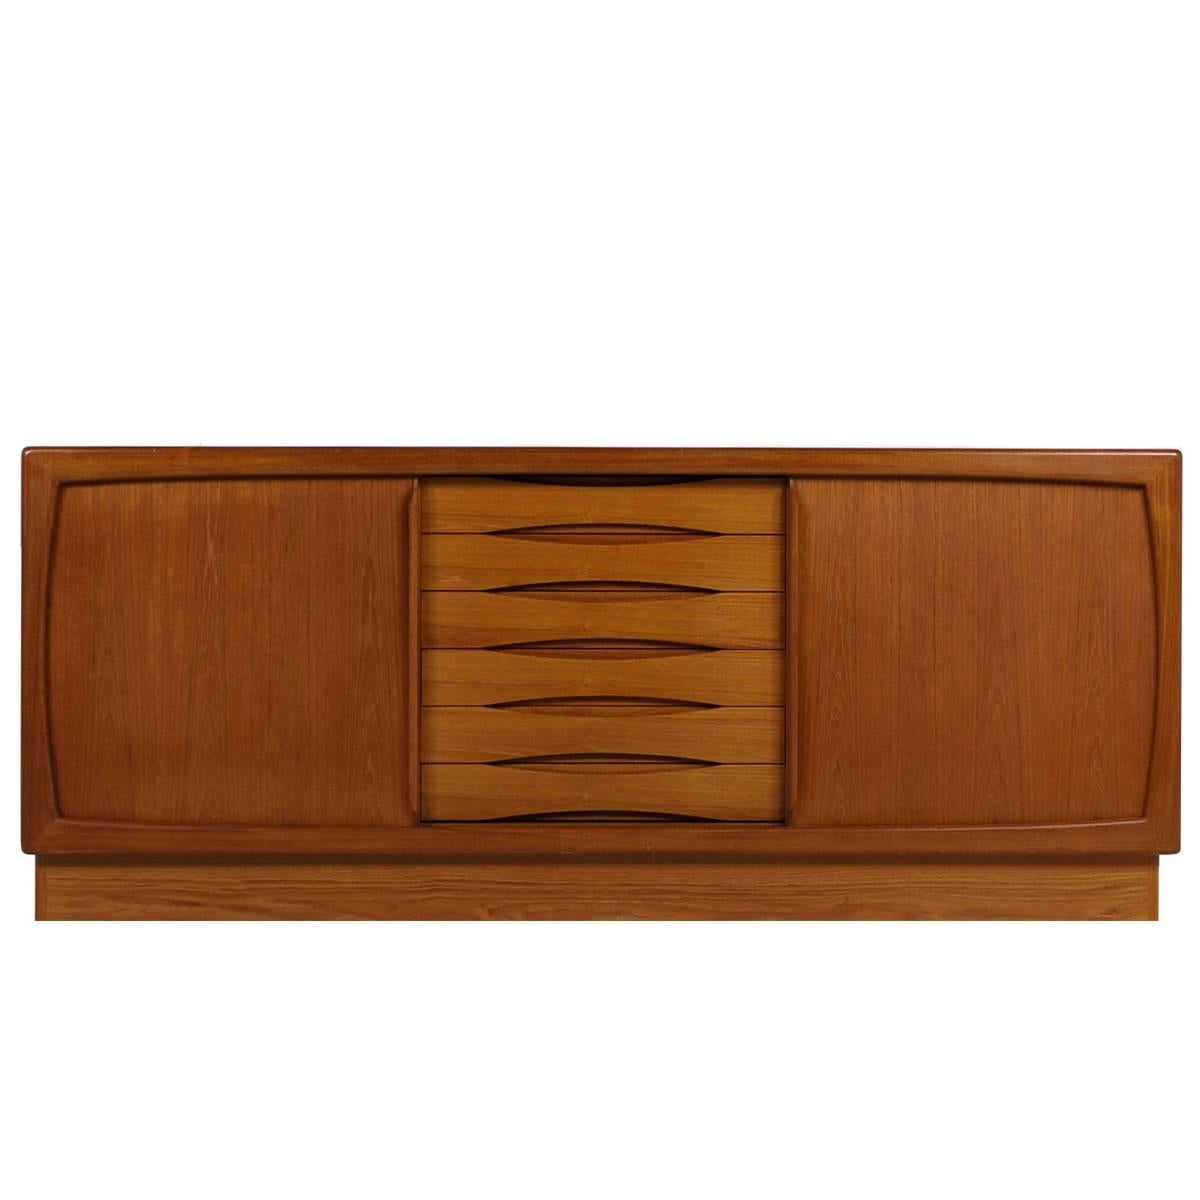 Danish Teak Sideboard With Sliding Doors 1960 For Sale At 1stdibs